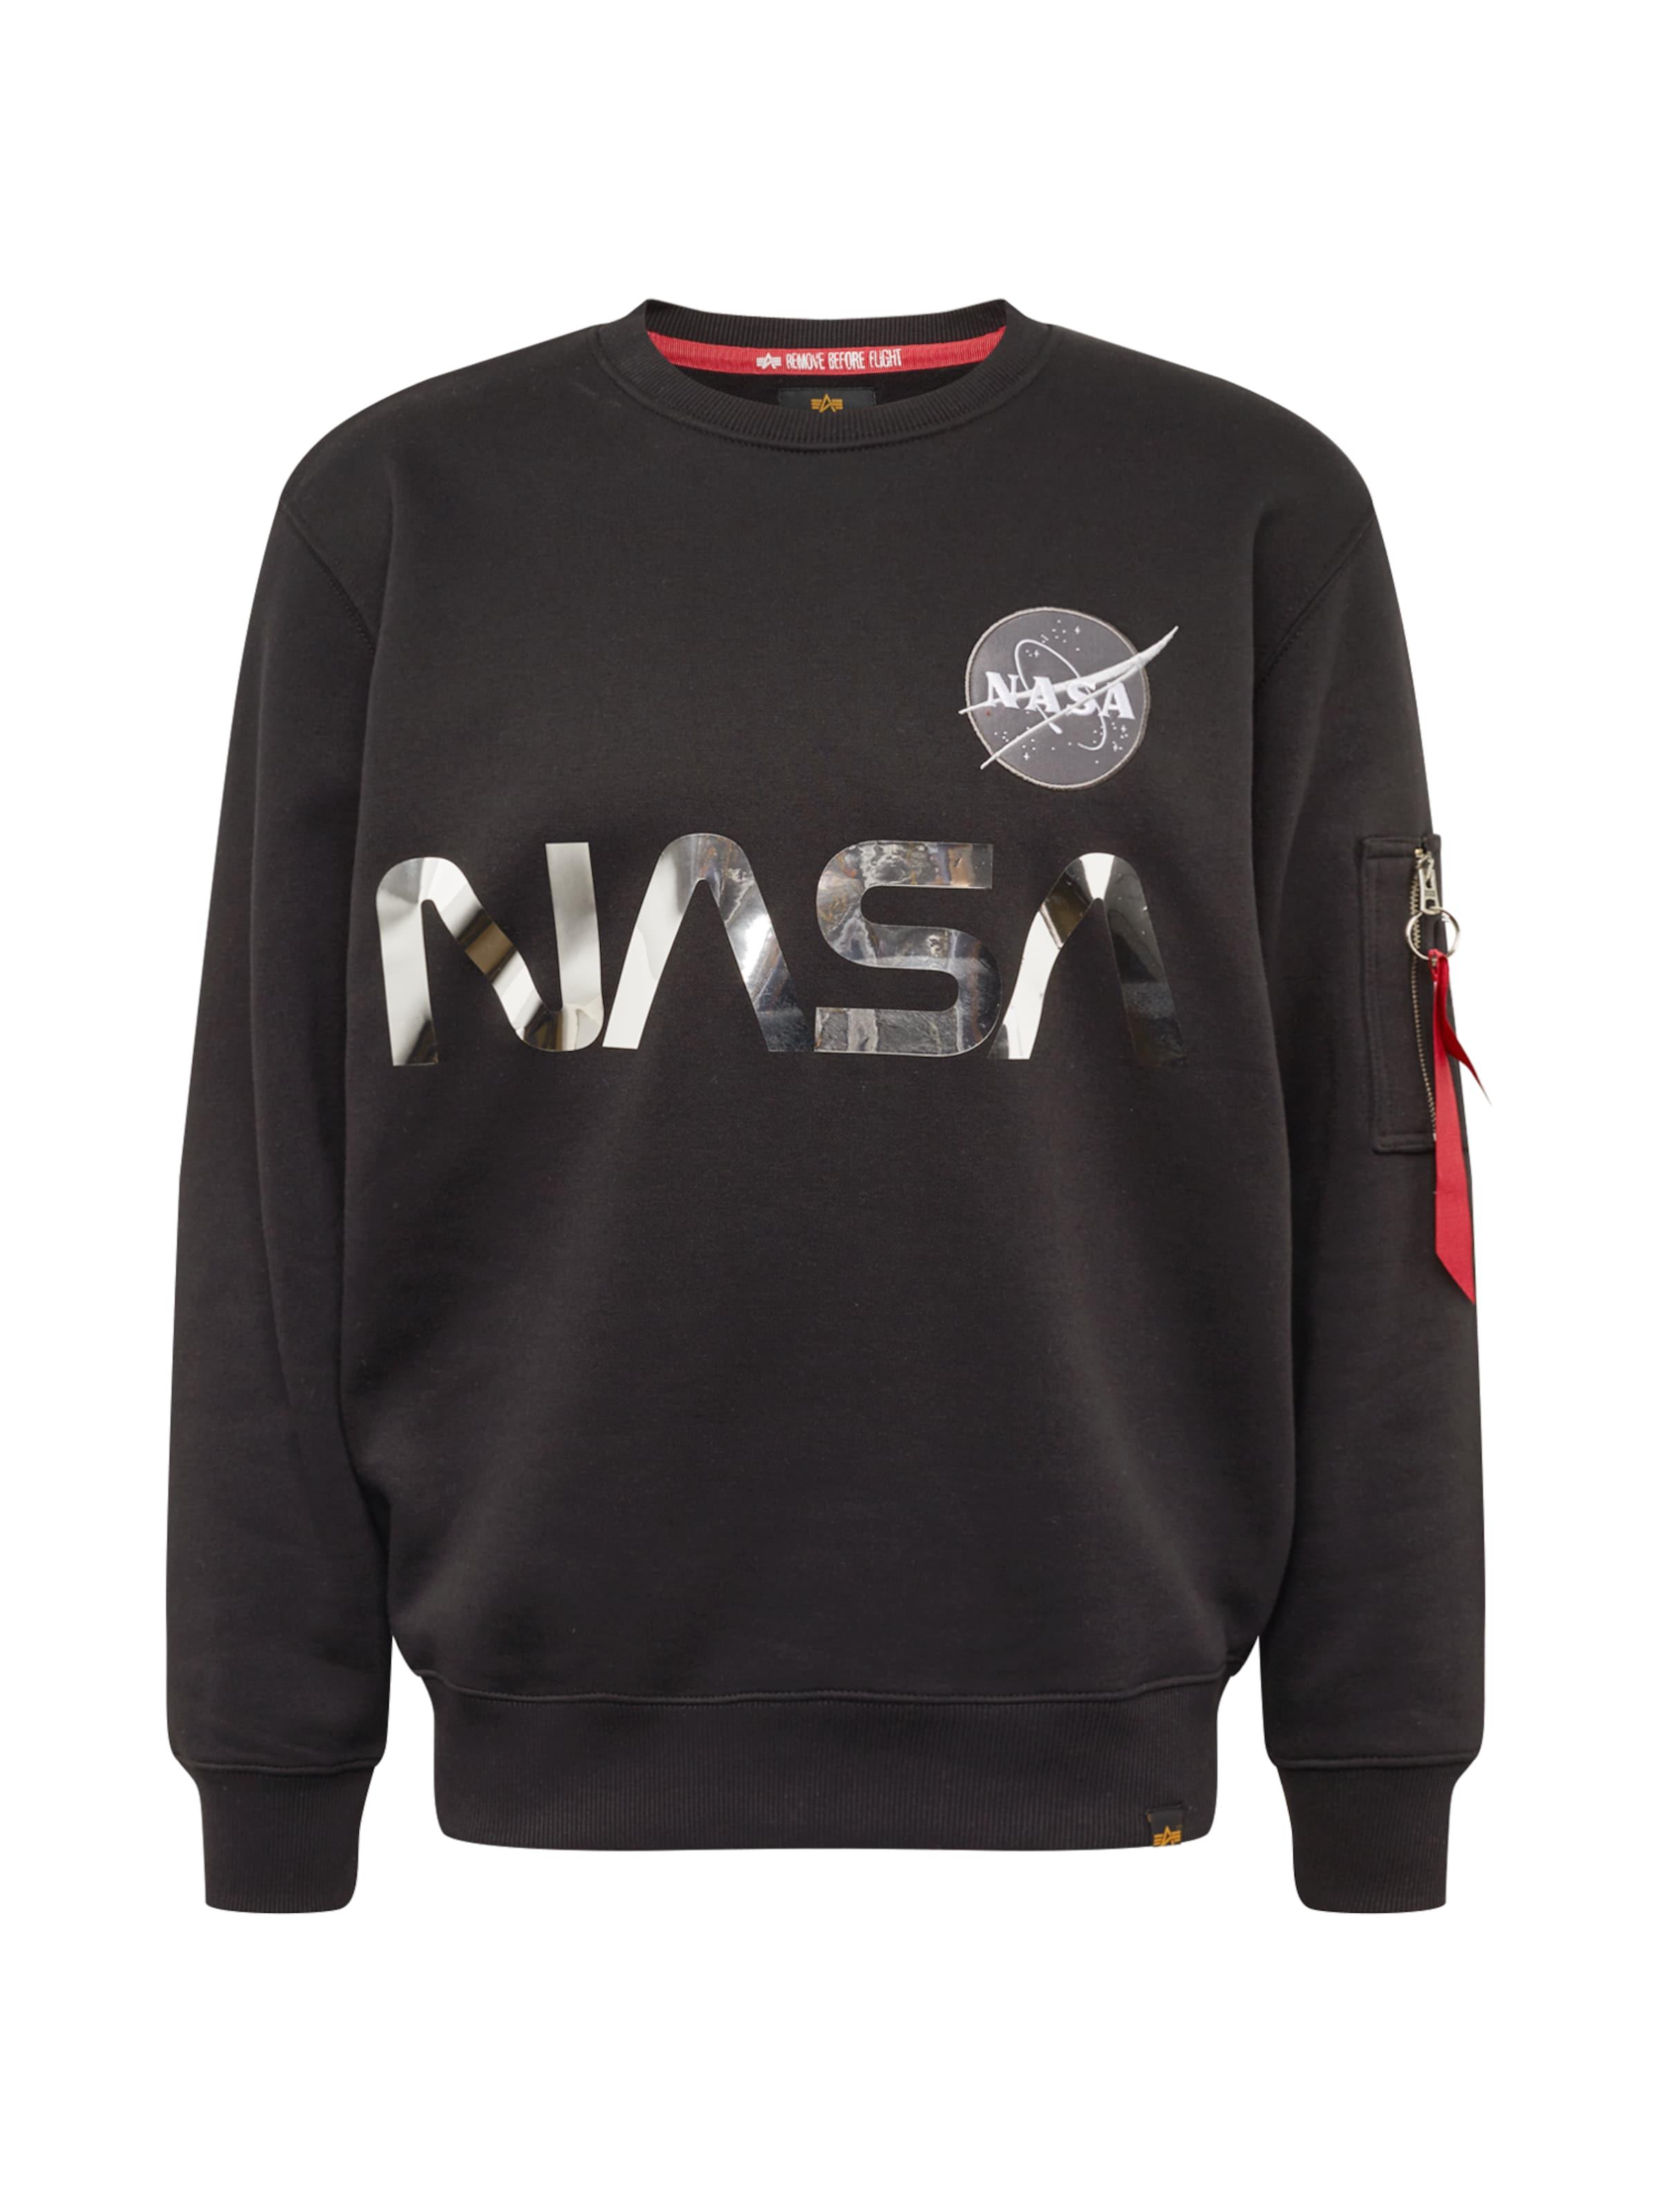 Sweatshirt 'nasa Reflective' Alpha In Industries GrauSchwarz n8vNwm0O